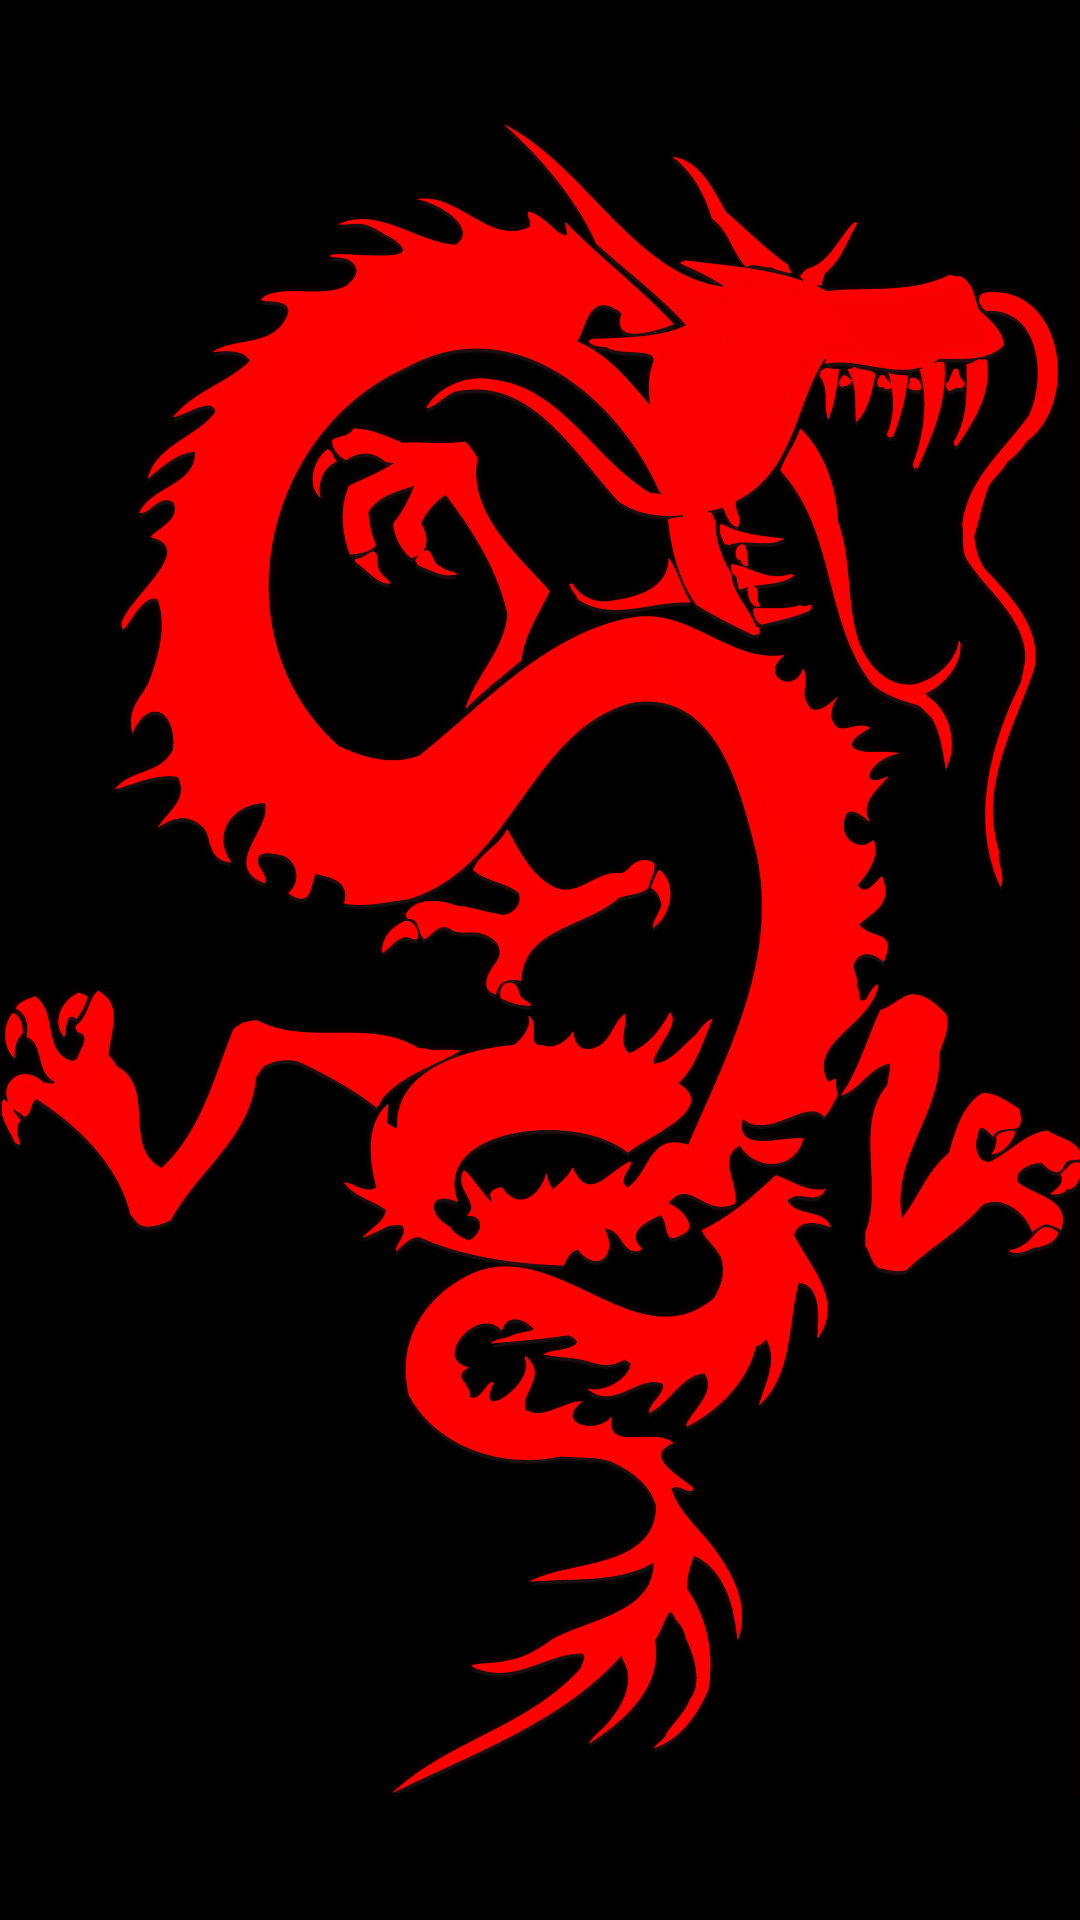 Free HD Red Dragon Phone Wallpaper1123